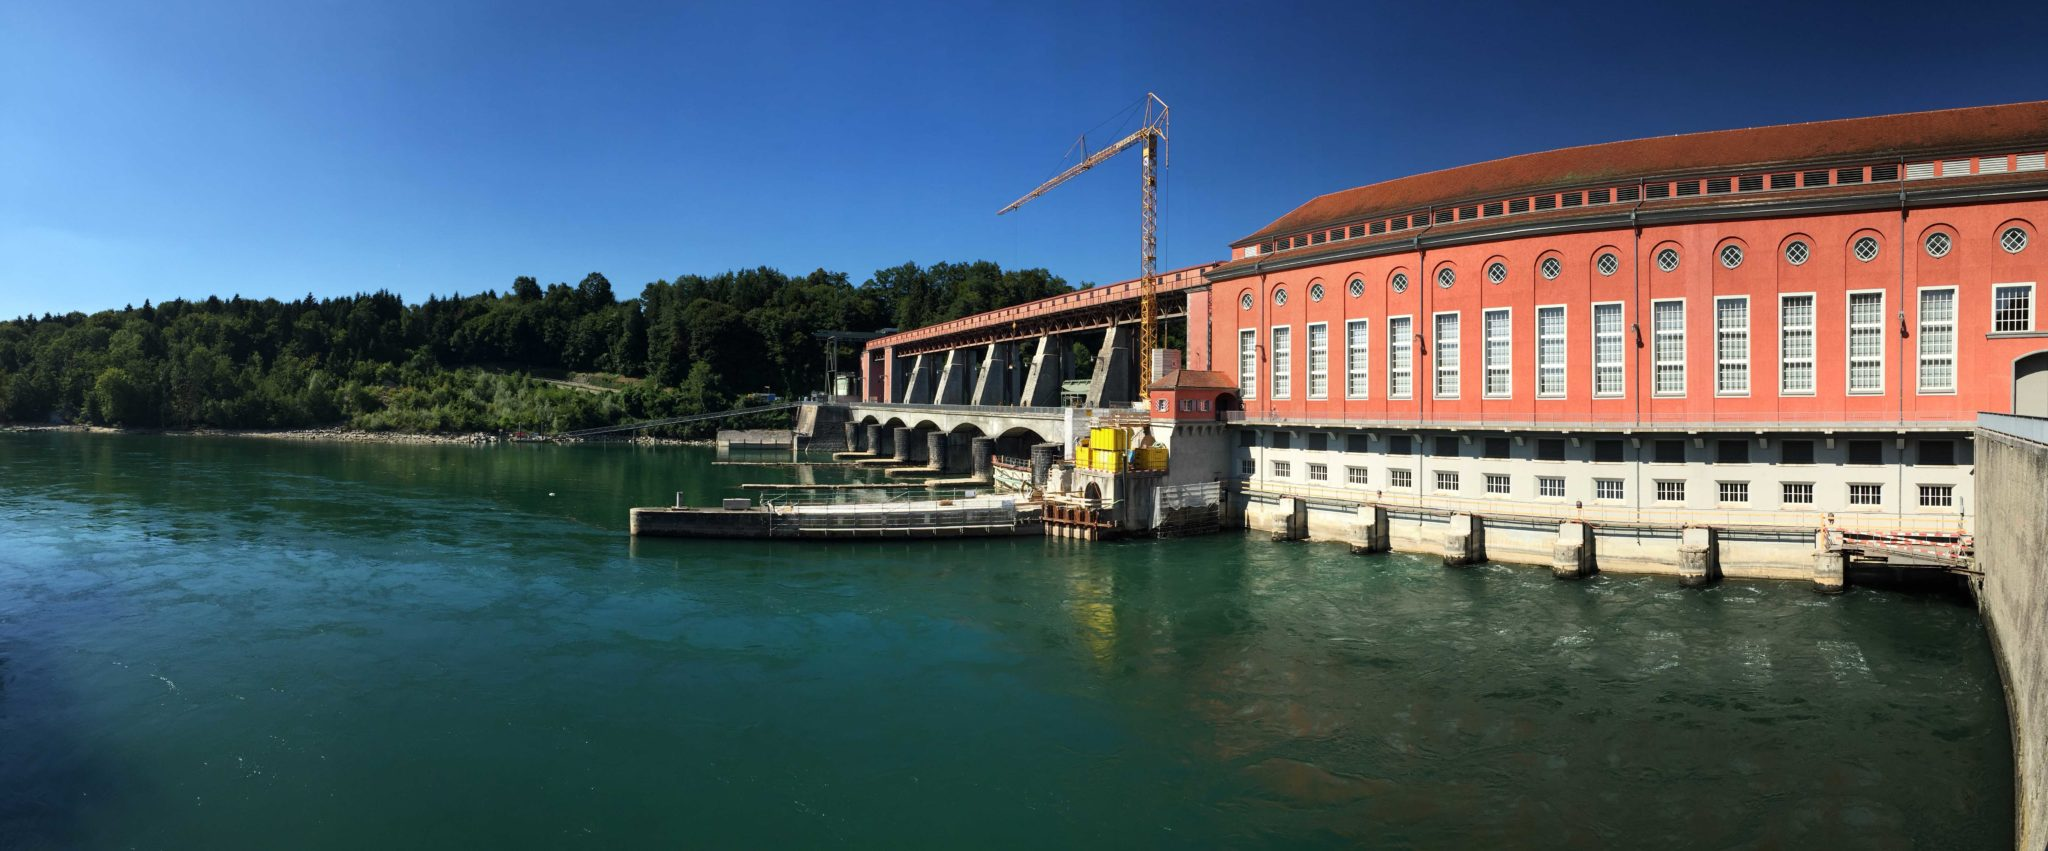 Case Study: Eglisau-Glattfelden Power Plant, Switzerland